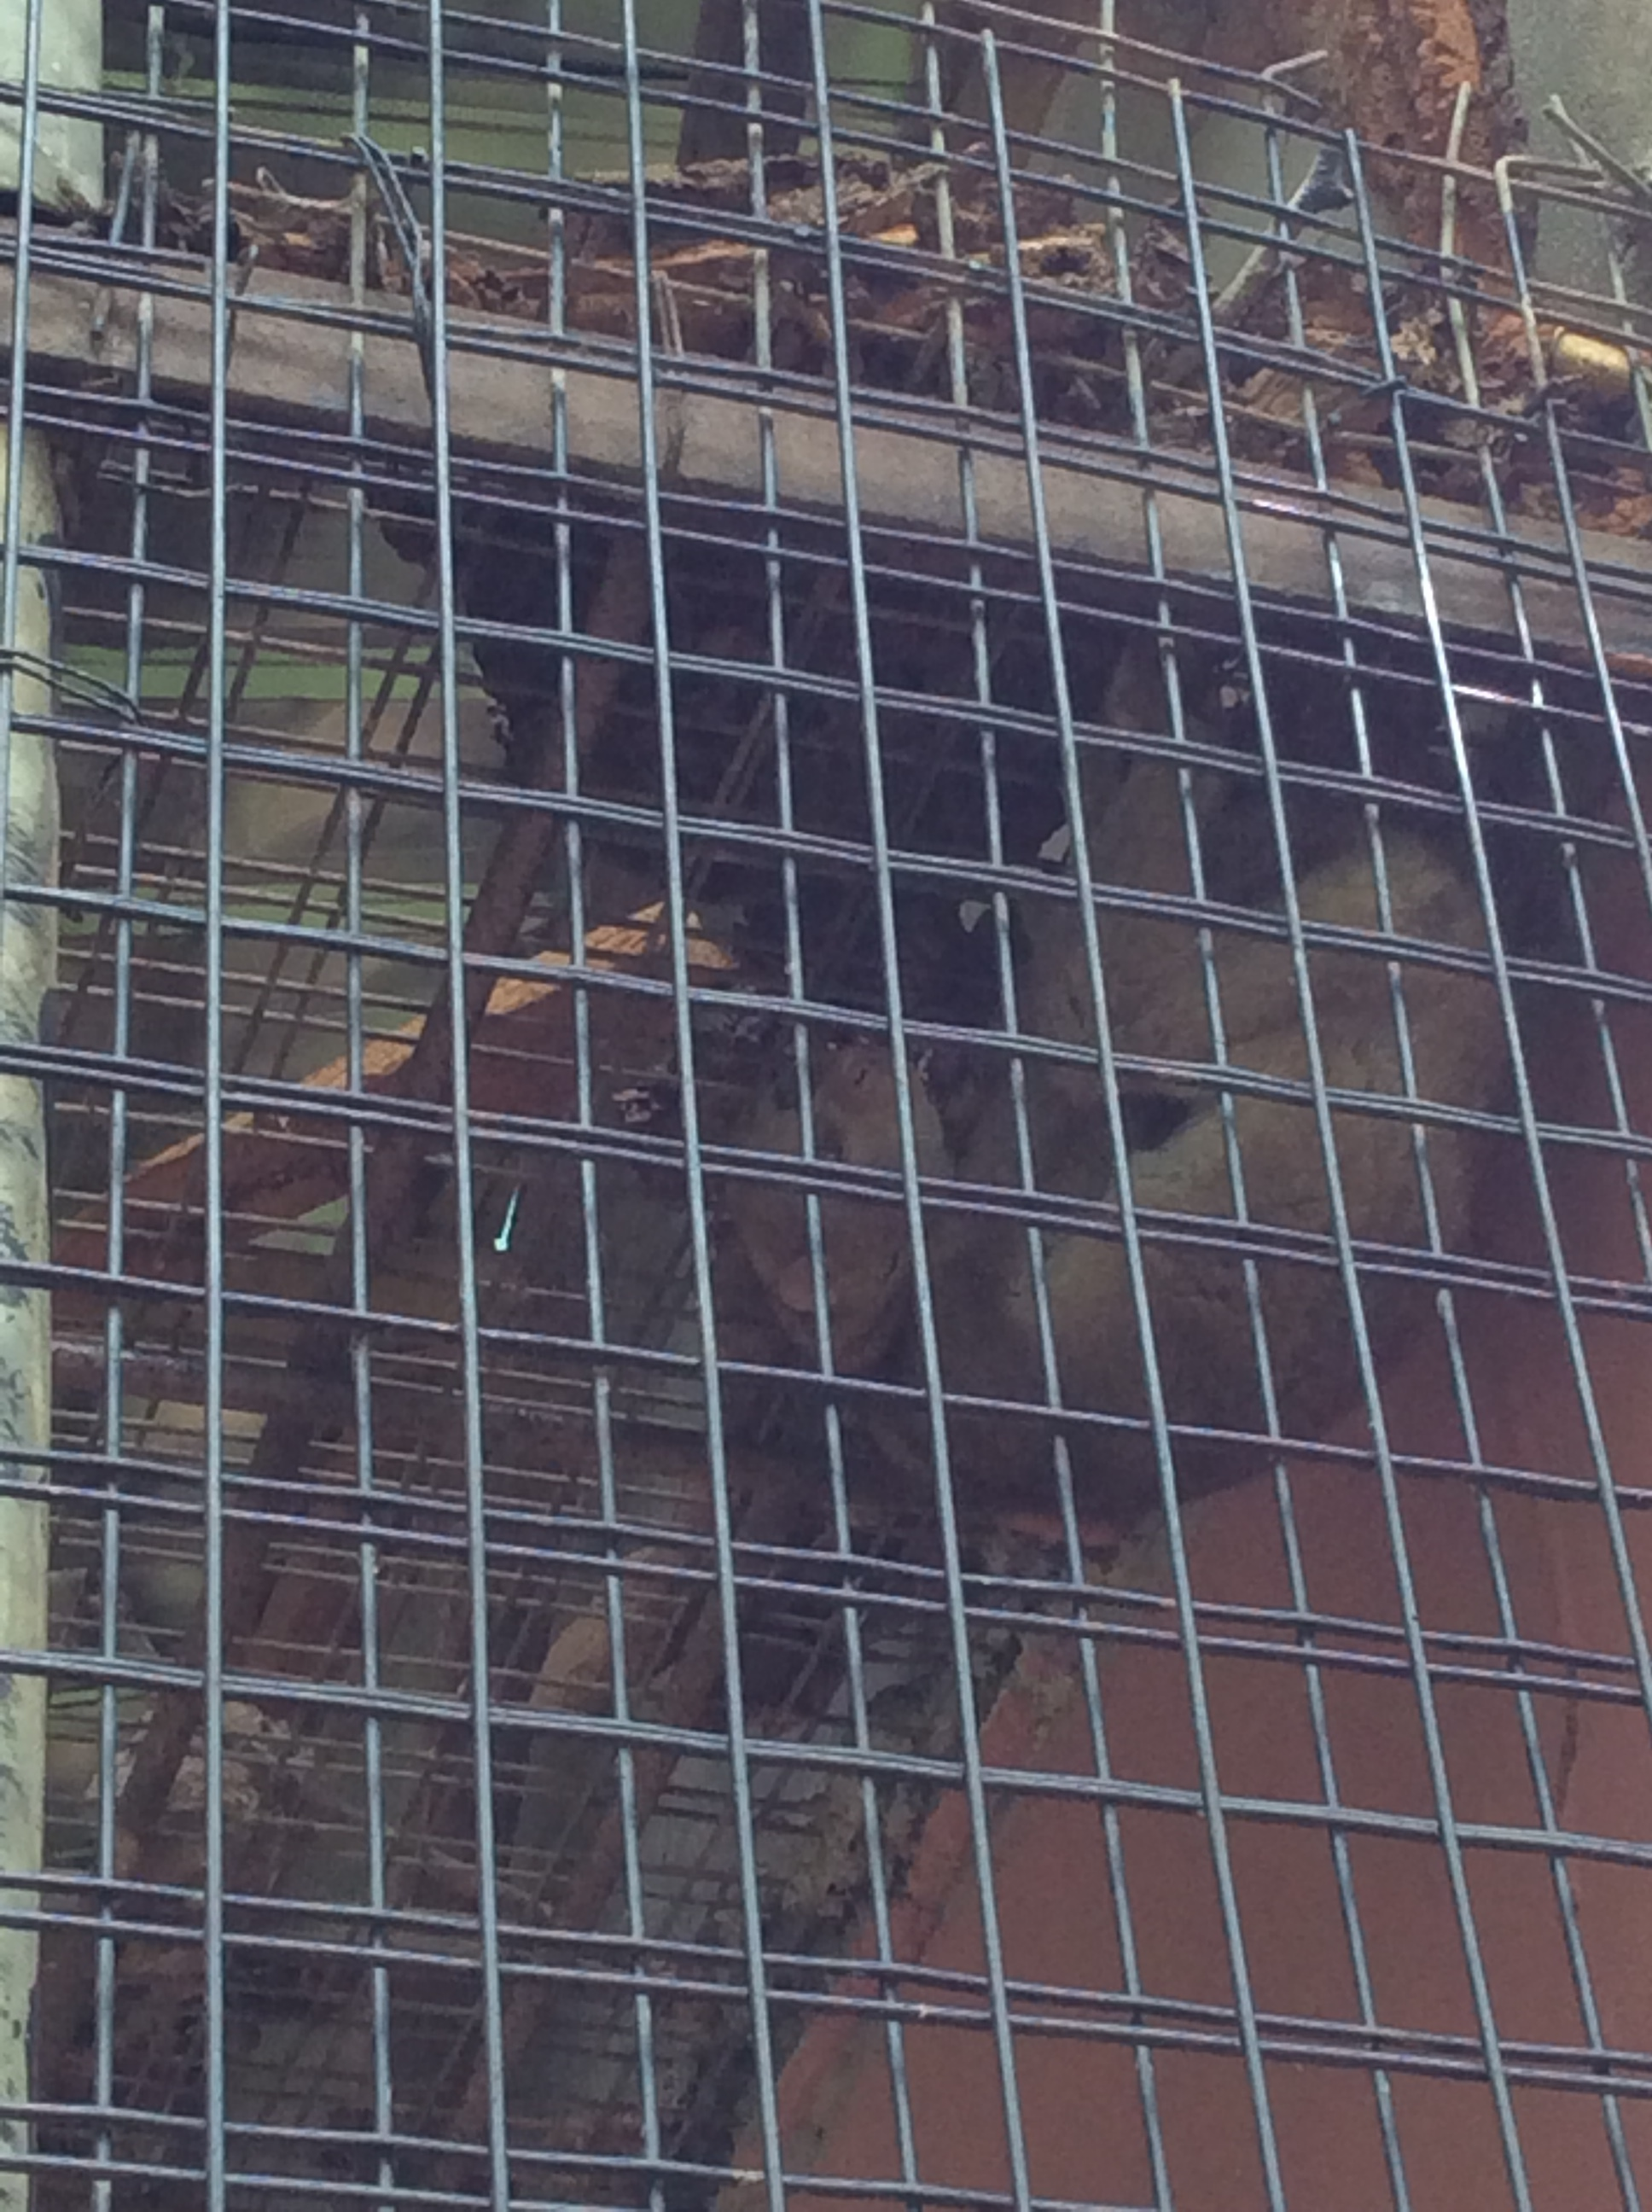 BUSH BABY ANIMAL IN THE ZOO | The Ajala Bug